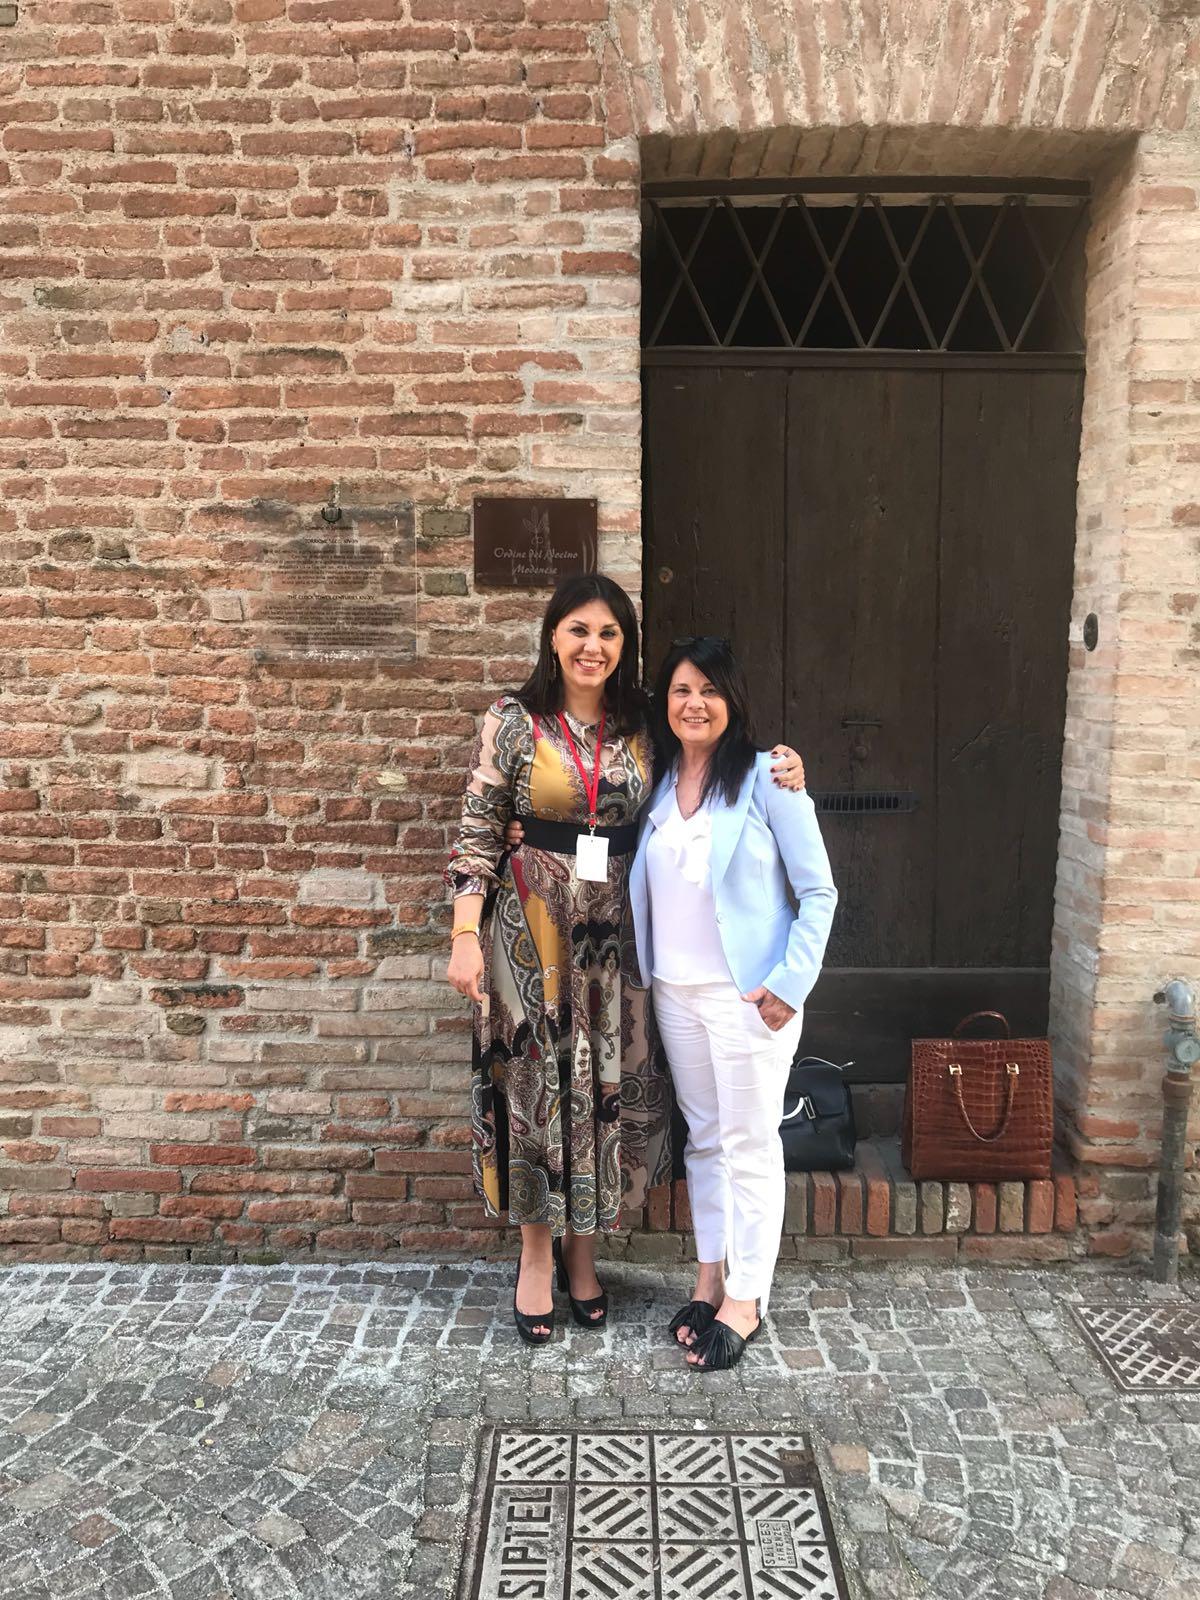 Gente felice a Vignaioli Contrari, con Vania Franceschelli e Franca Bertani.